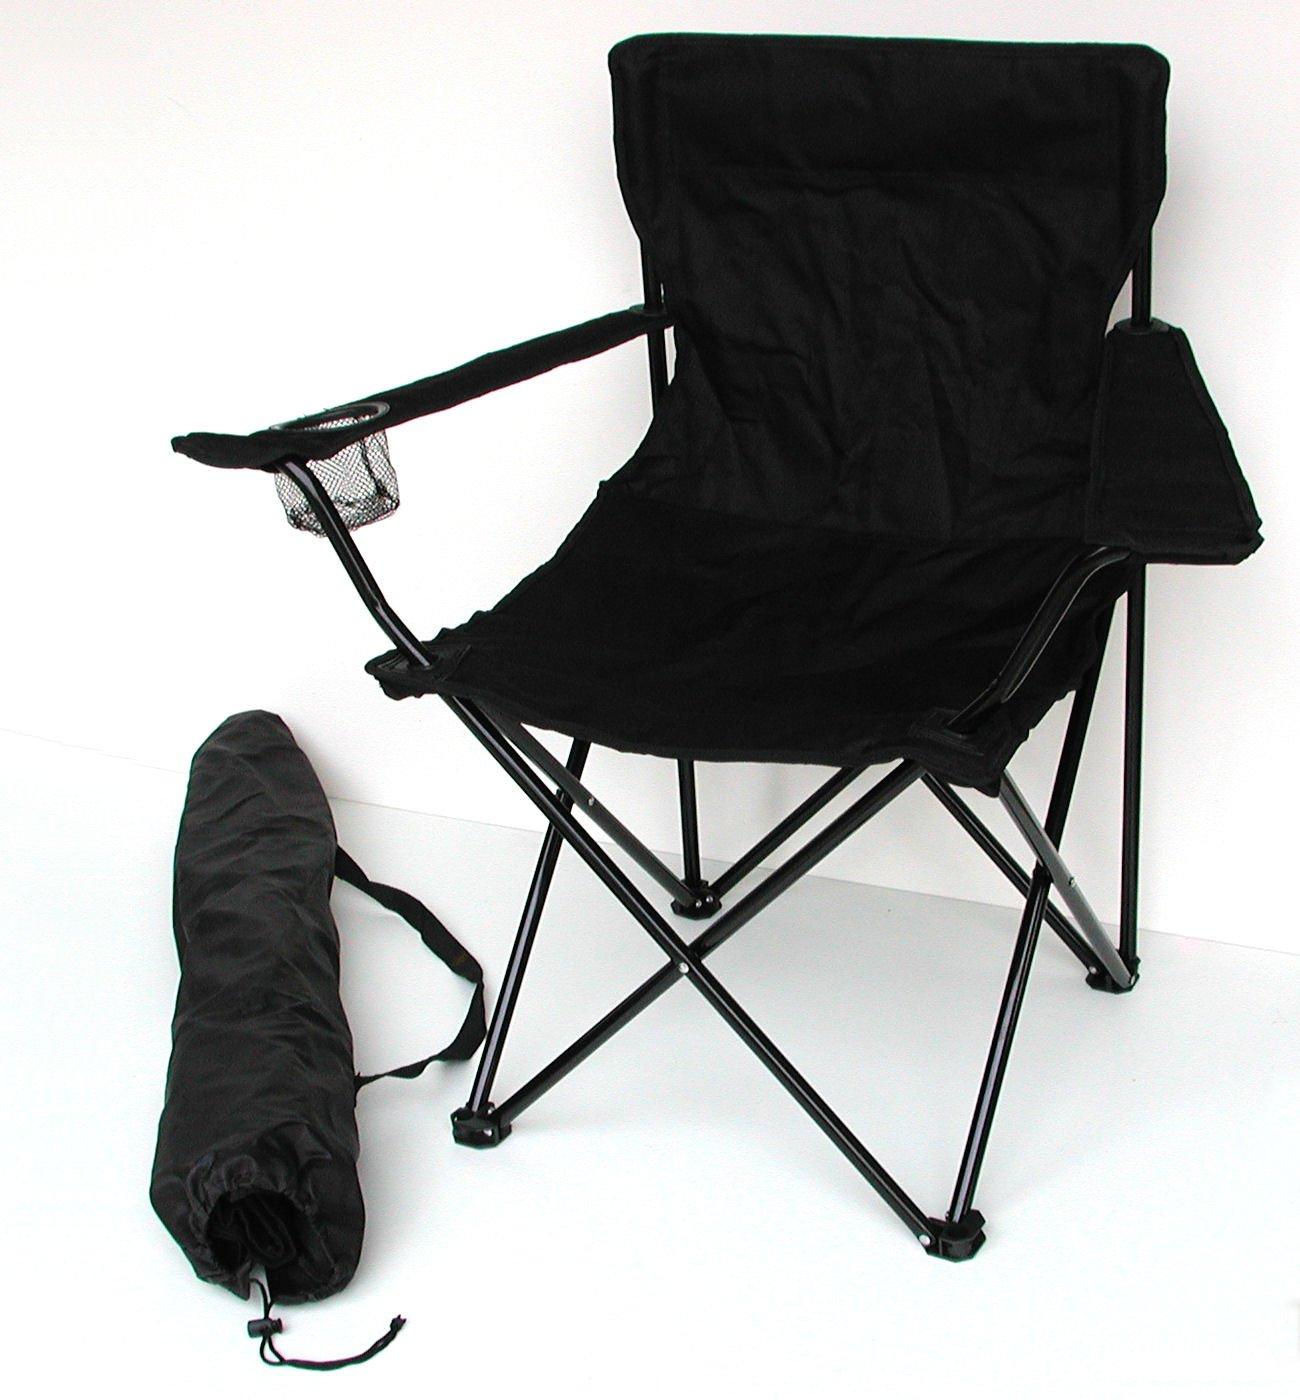 Campingstühle günstig klappbar